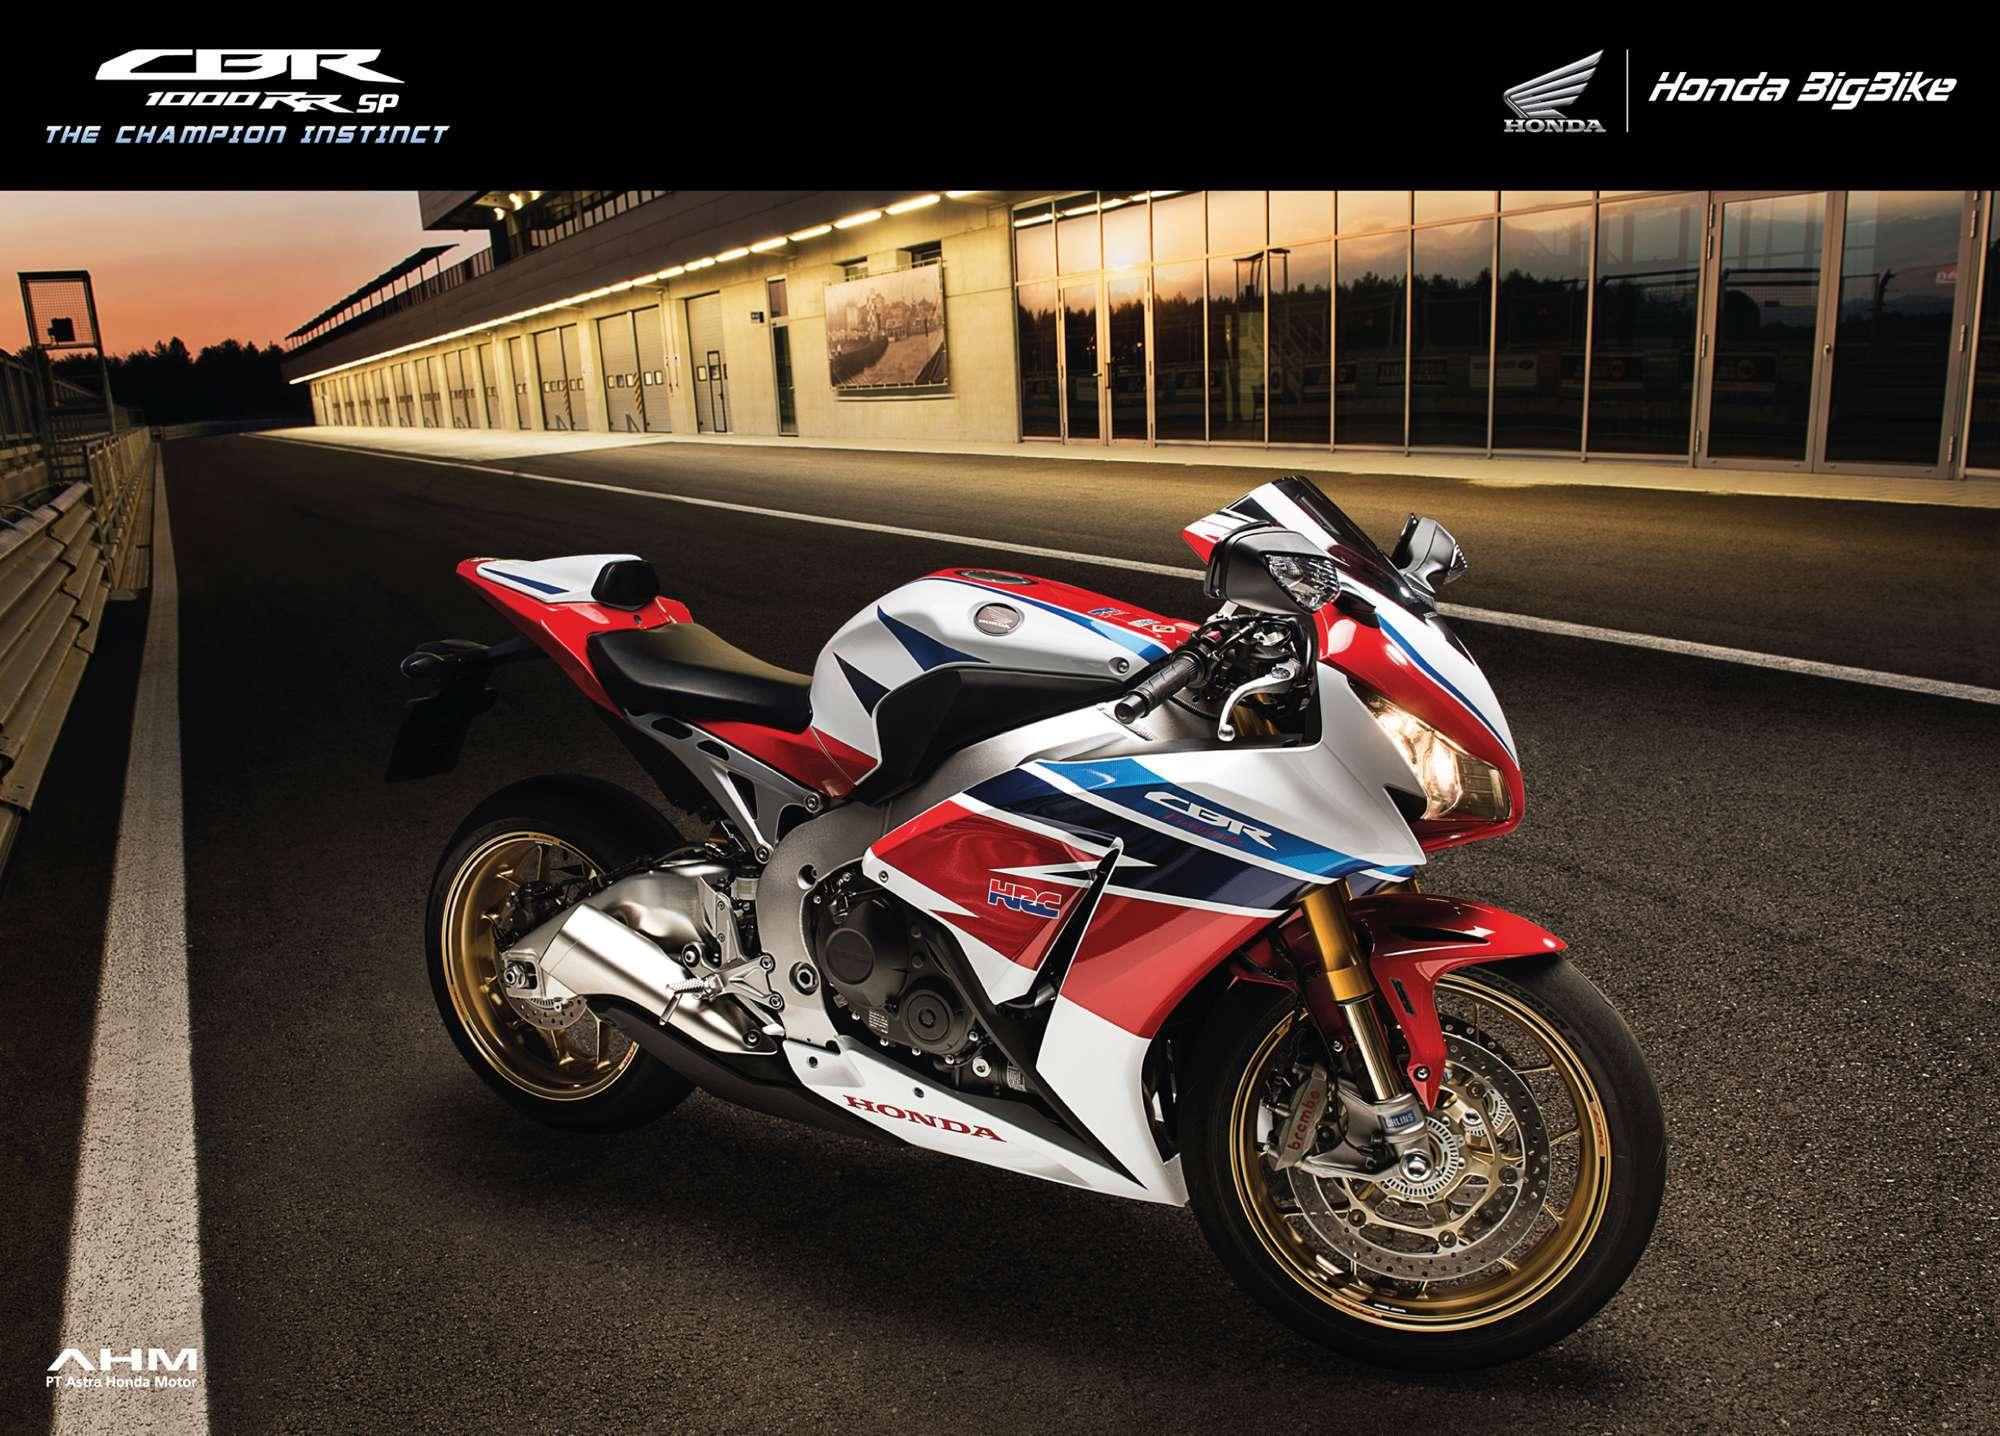 Brosur Motor Honda Indonesia Cengkareng Cb150 Verza Cash Wheel Bold Red Kab Semarang Cbr 1000 Rr Sp